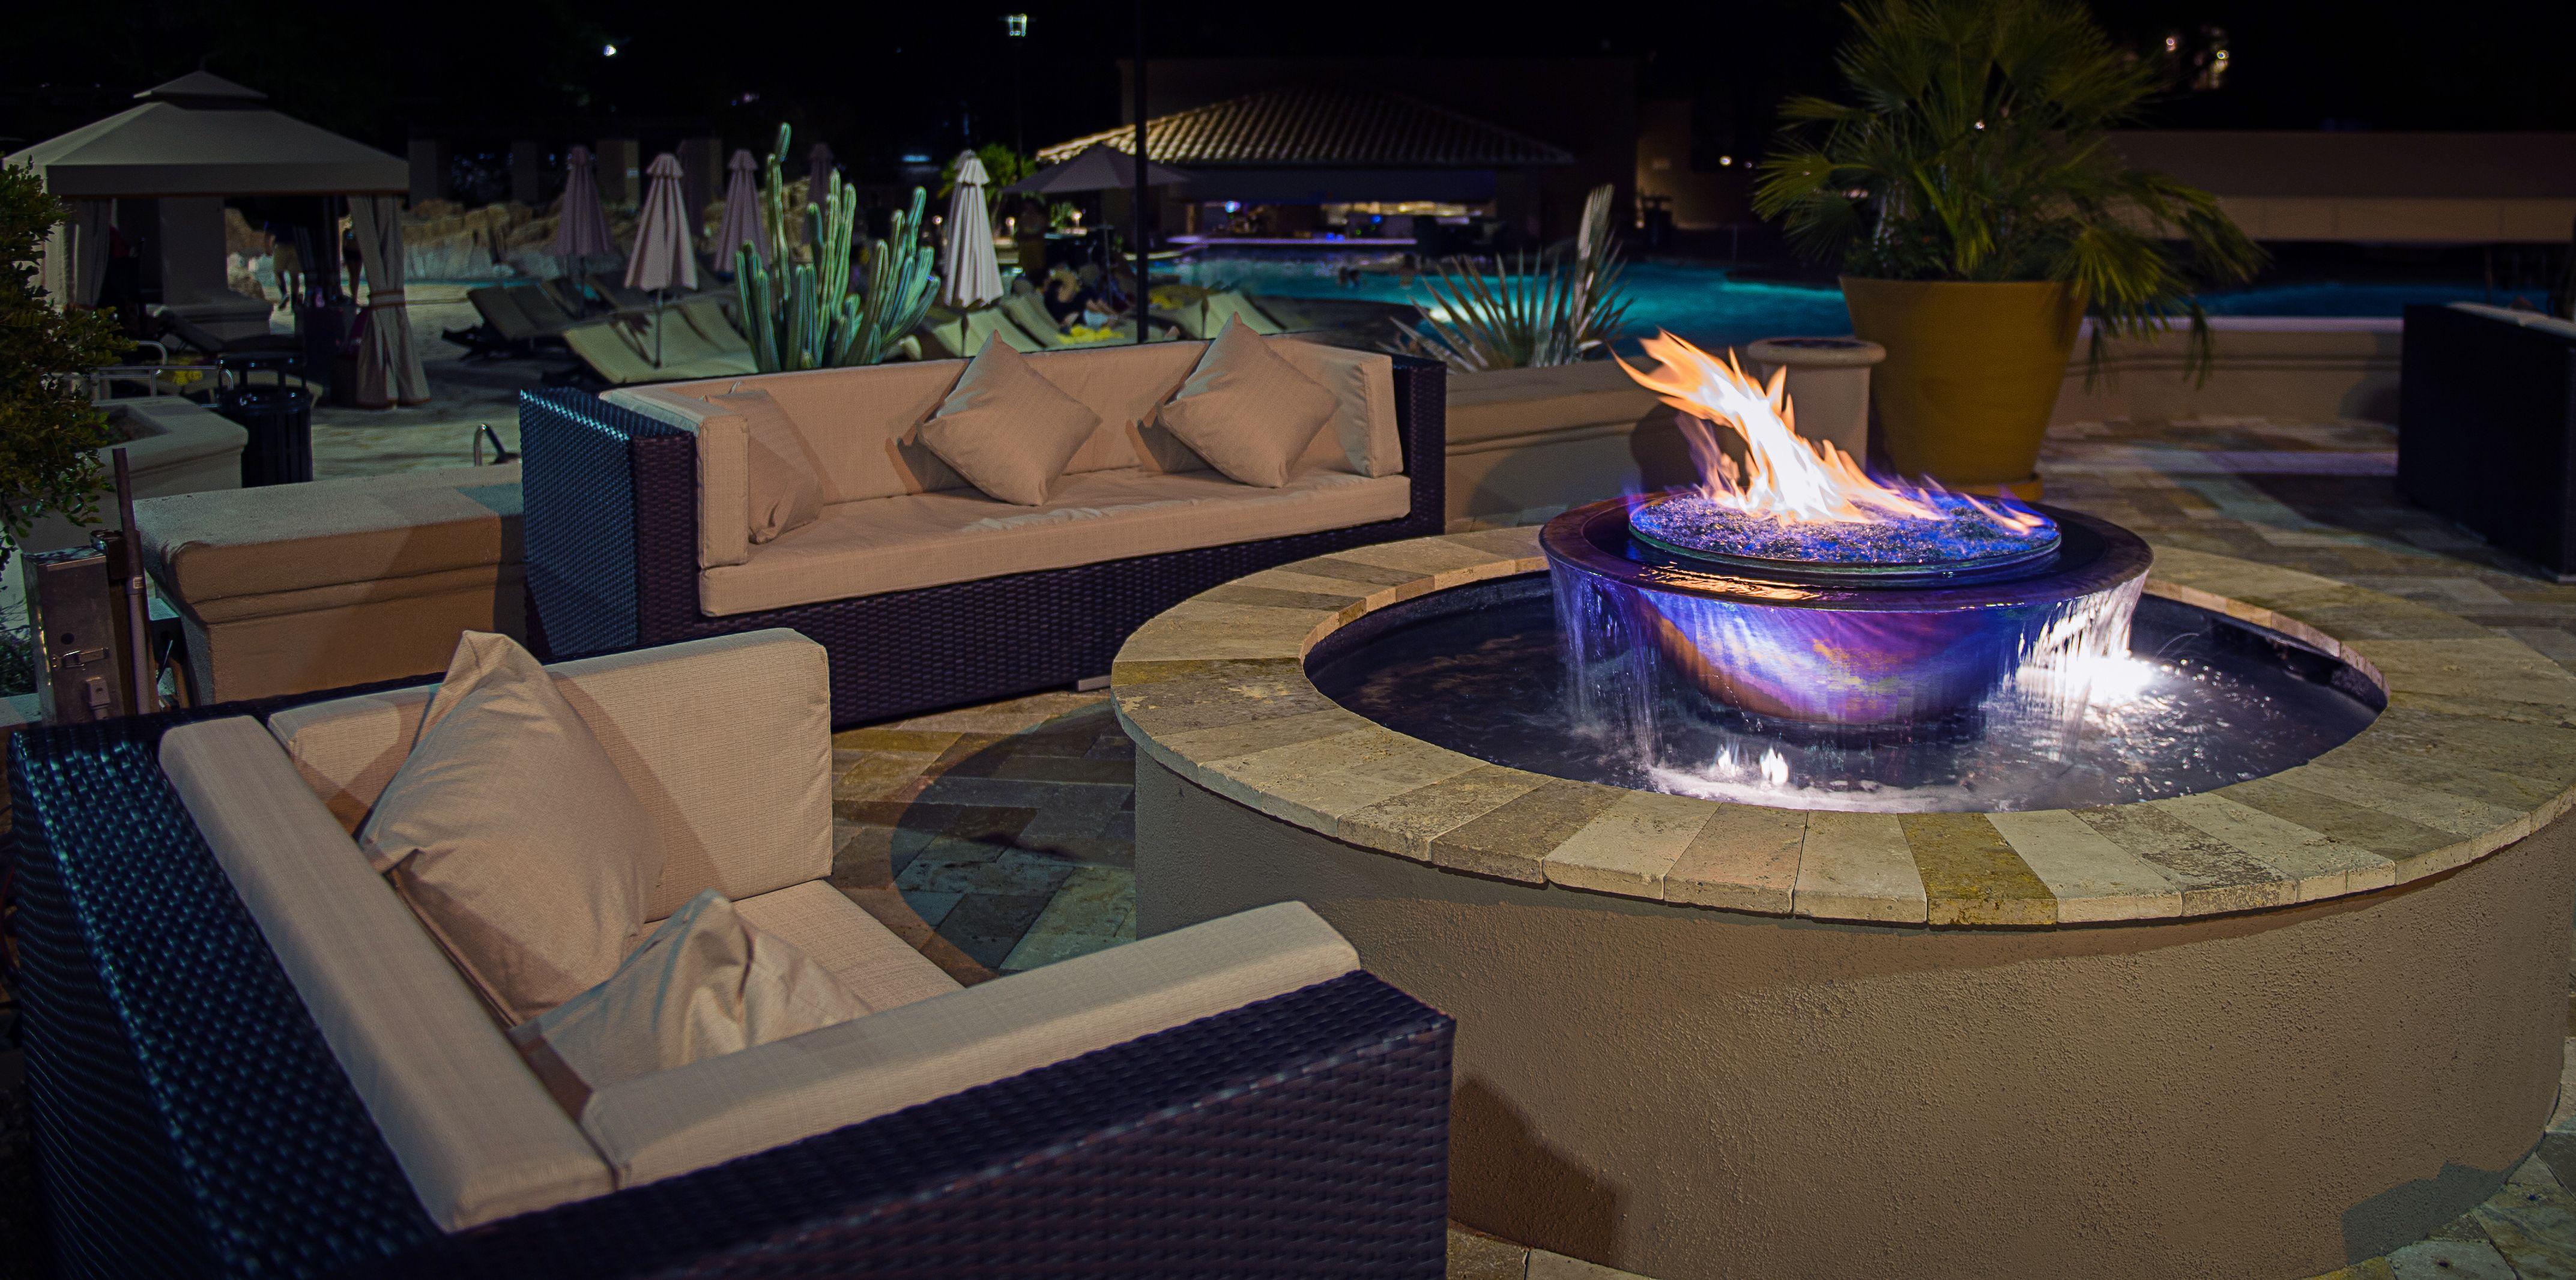 Fire Pit Warm The Westin La Paloma Resort Spa Tucson